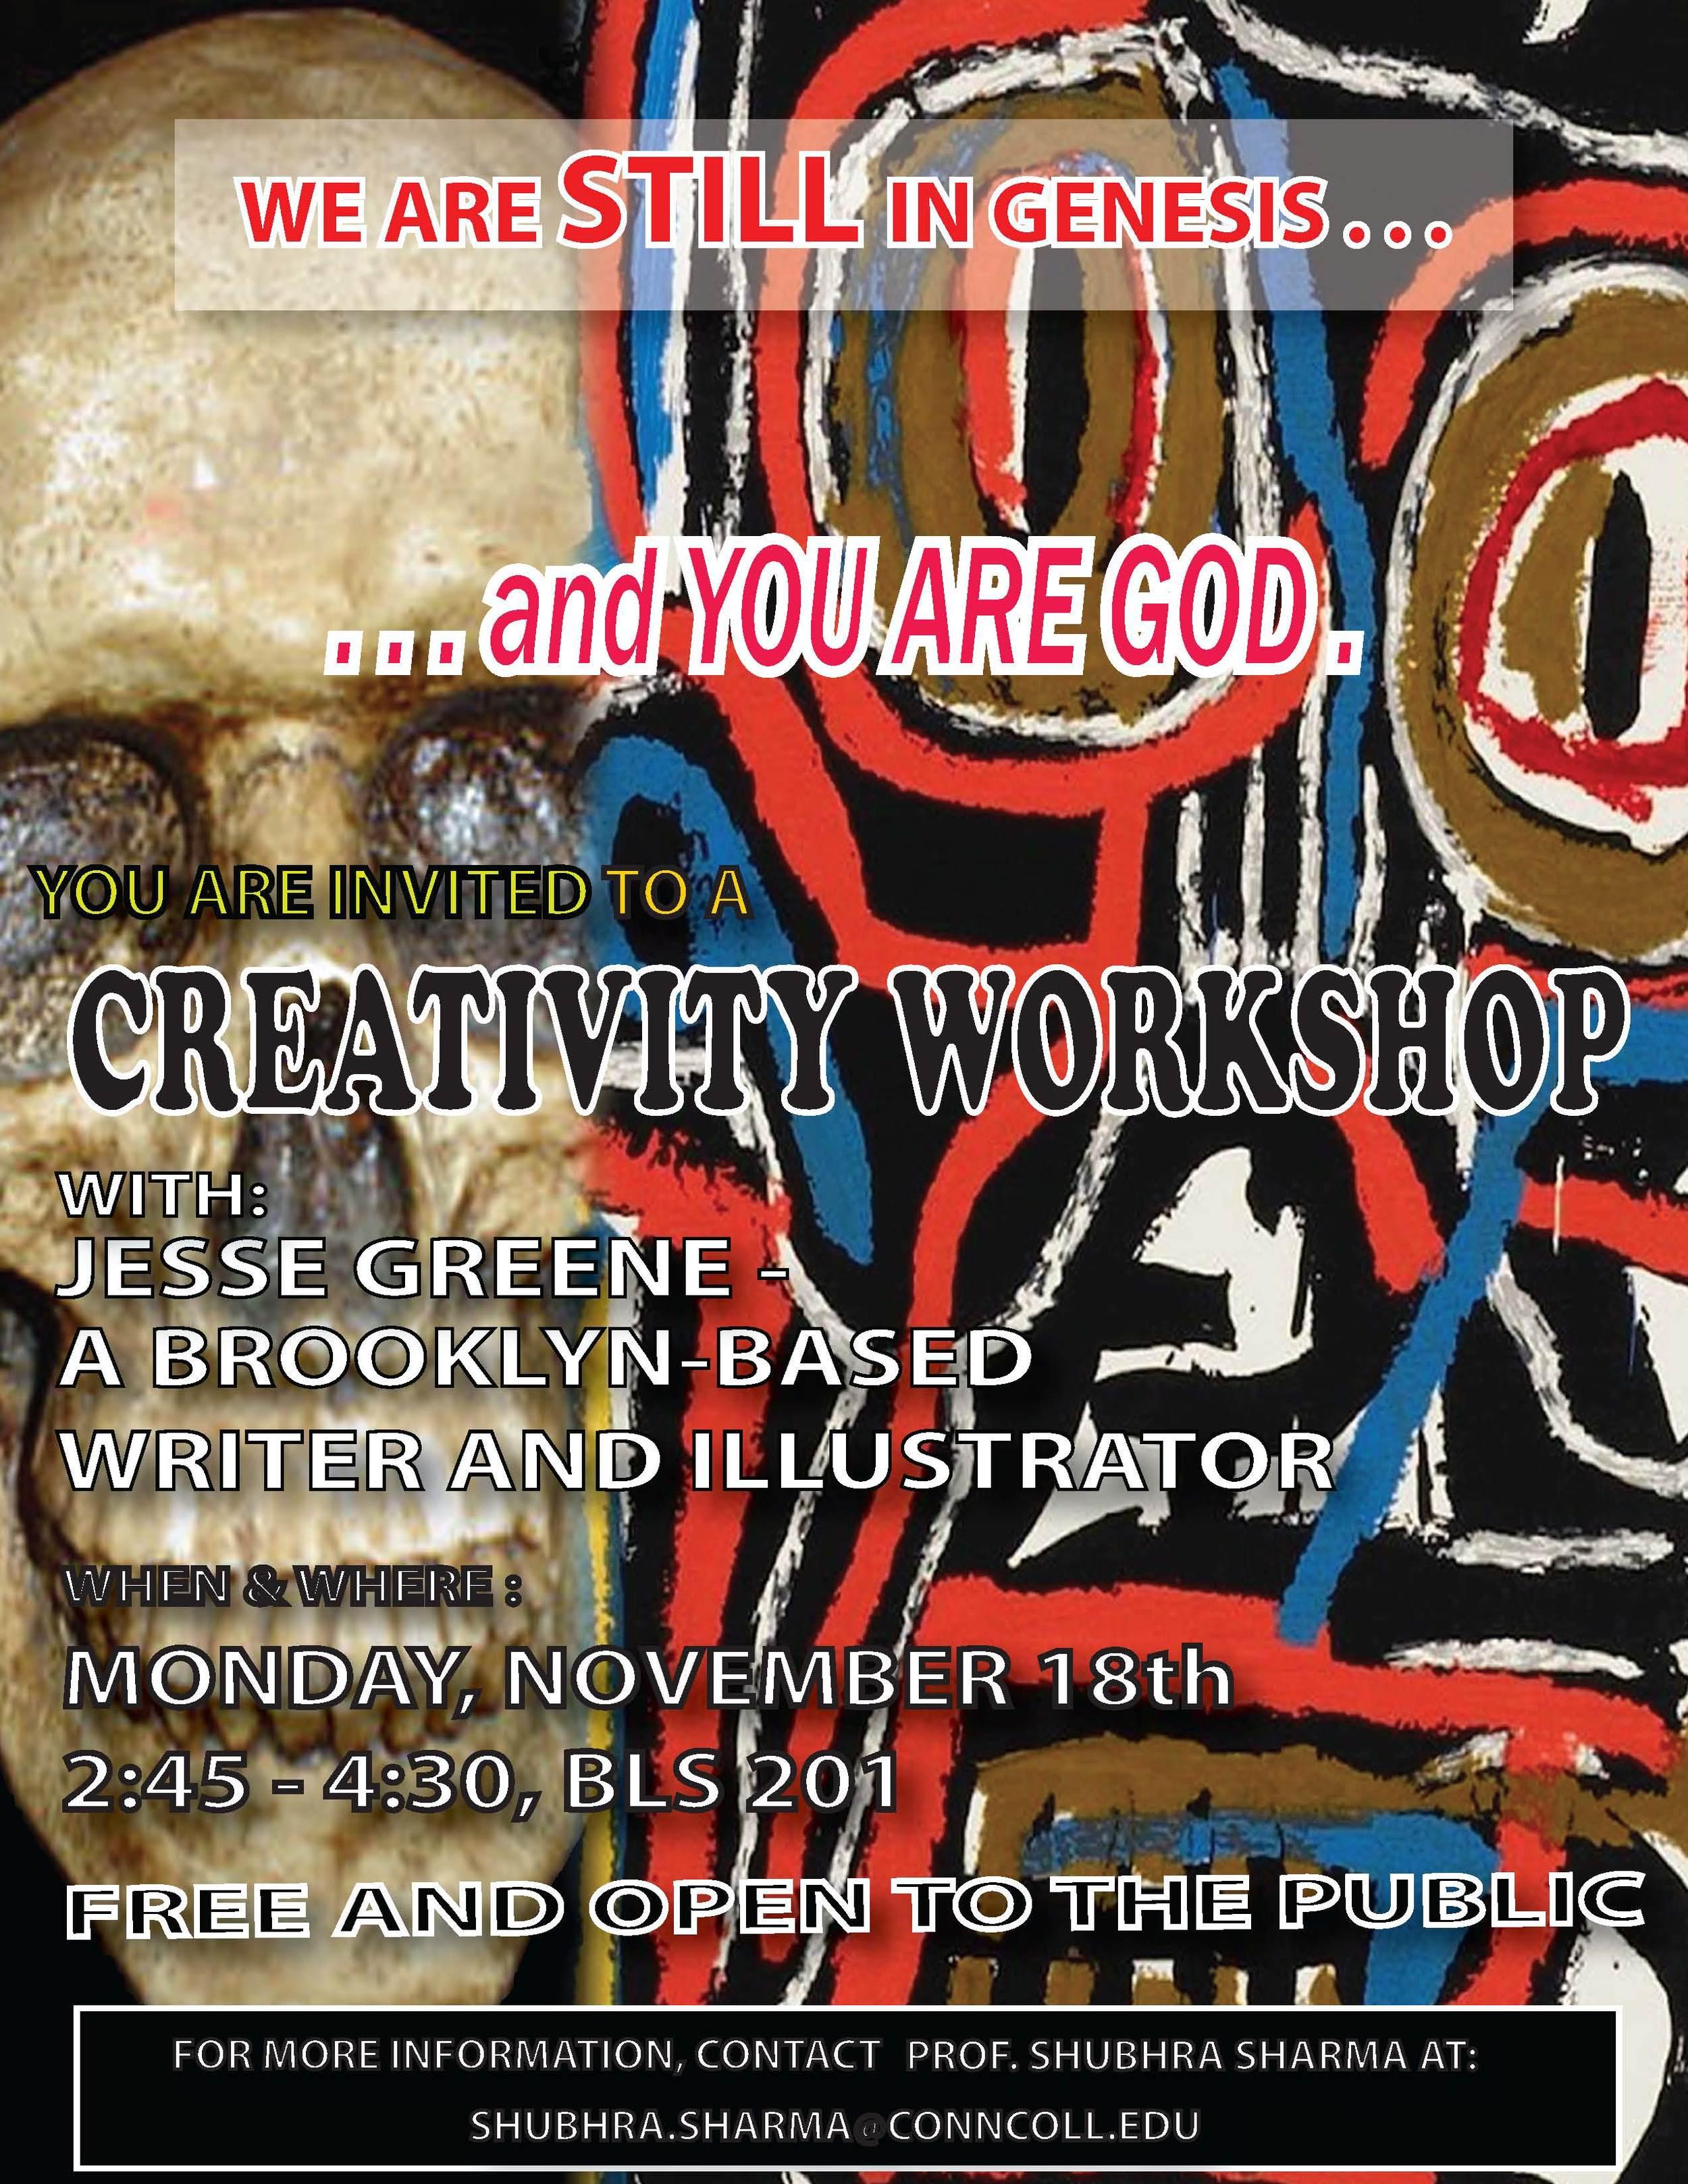 Creativity Workshop Poster.jpg